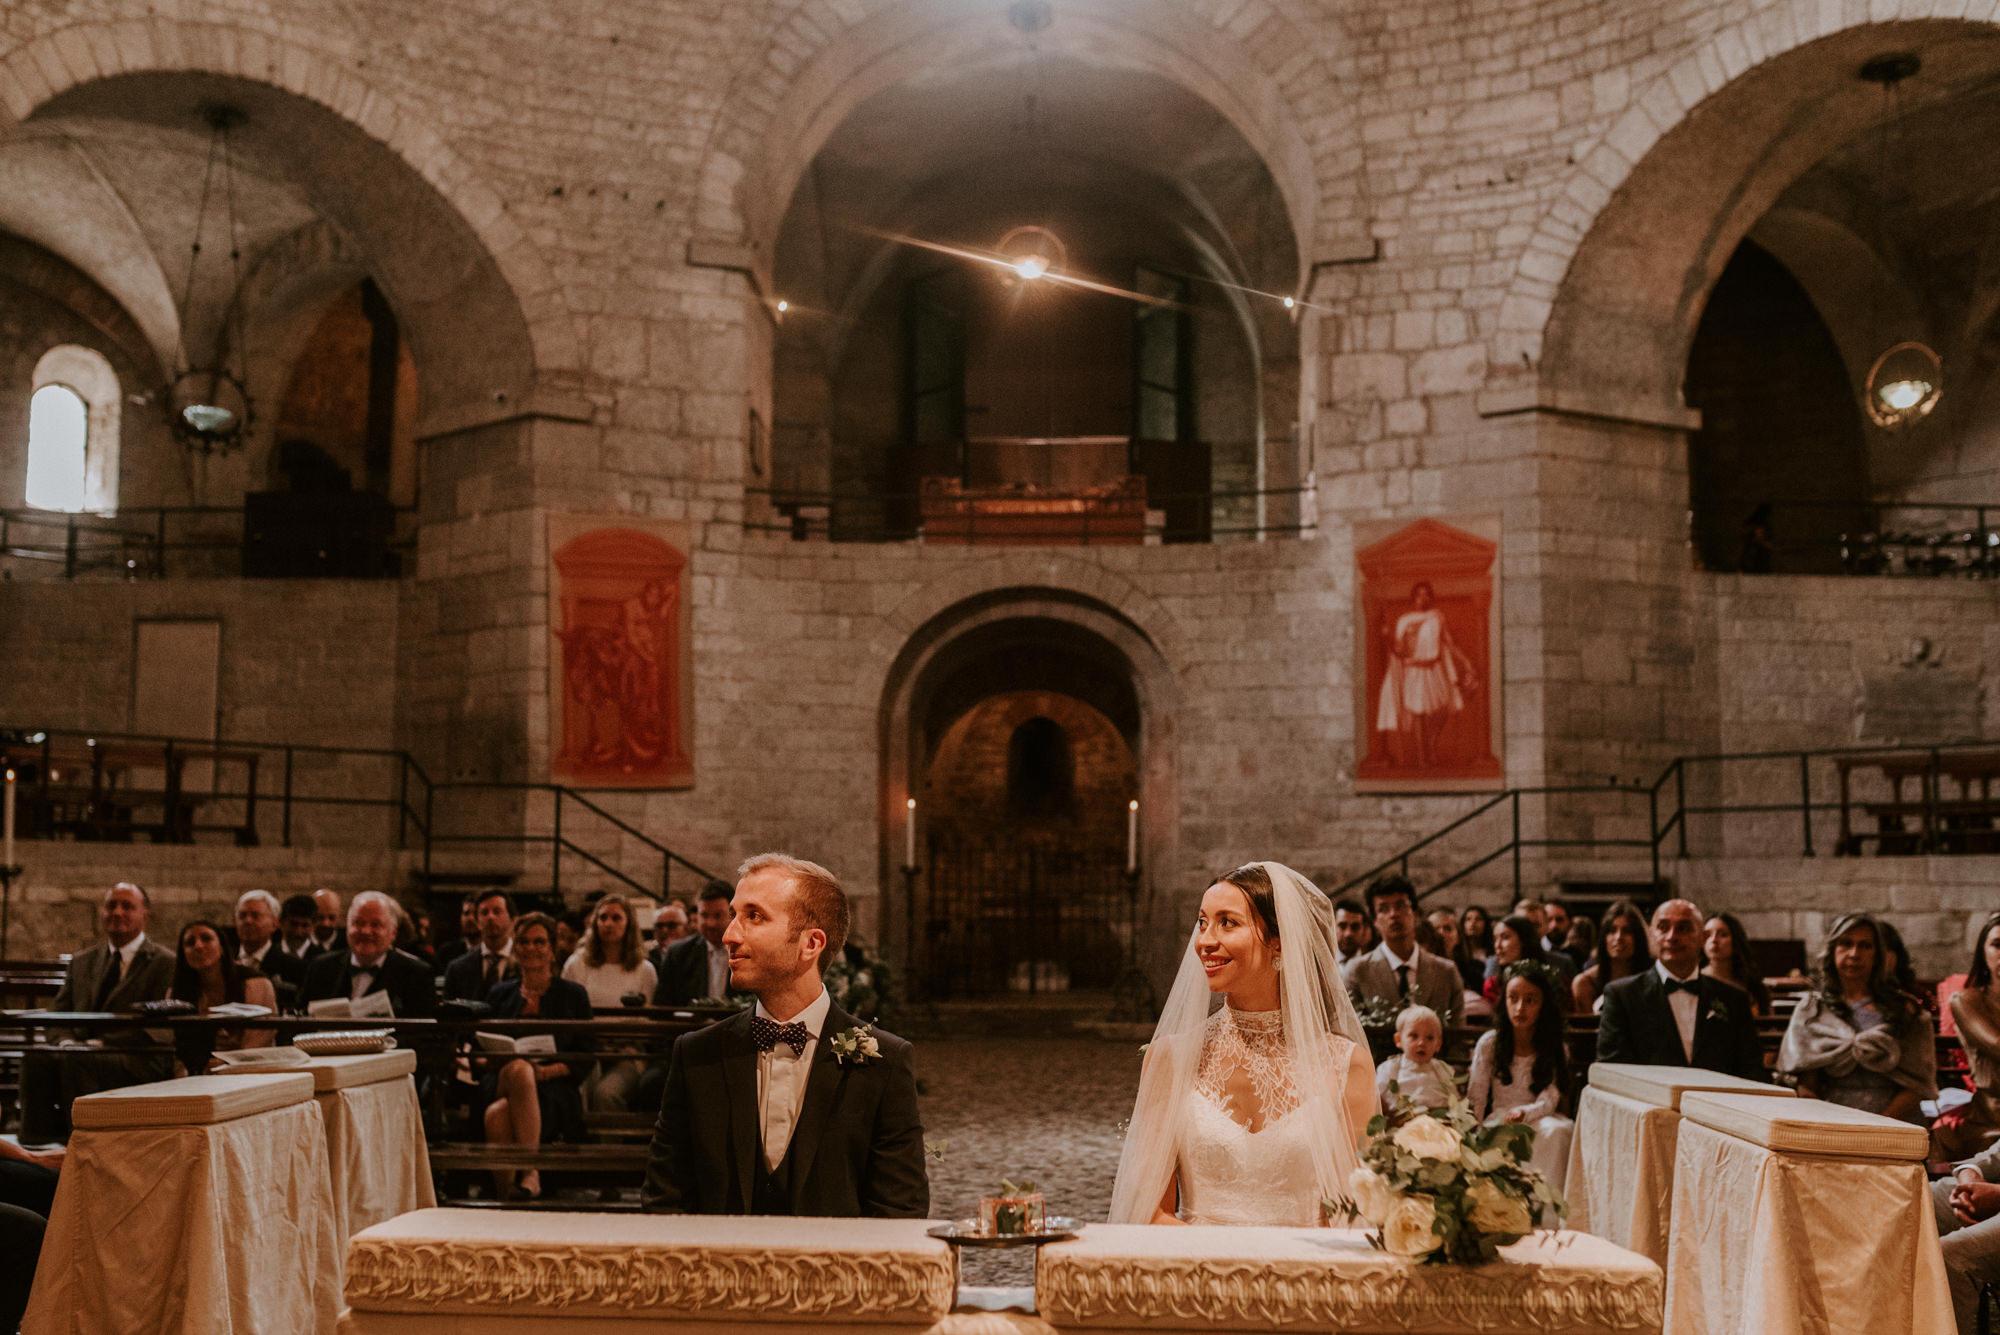 FOTO+PHOTO+BODA+WEDDING+ITALIA+ITALY+MAURICIO+GARAY+MAURICIOGARAY+WEDDINPHOTOGRAPHER+FOTOGRAFODEBODA-831.jpg